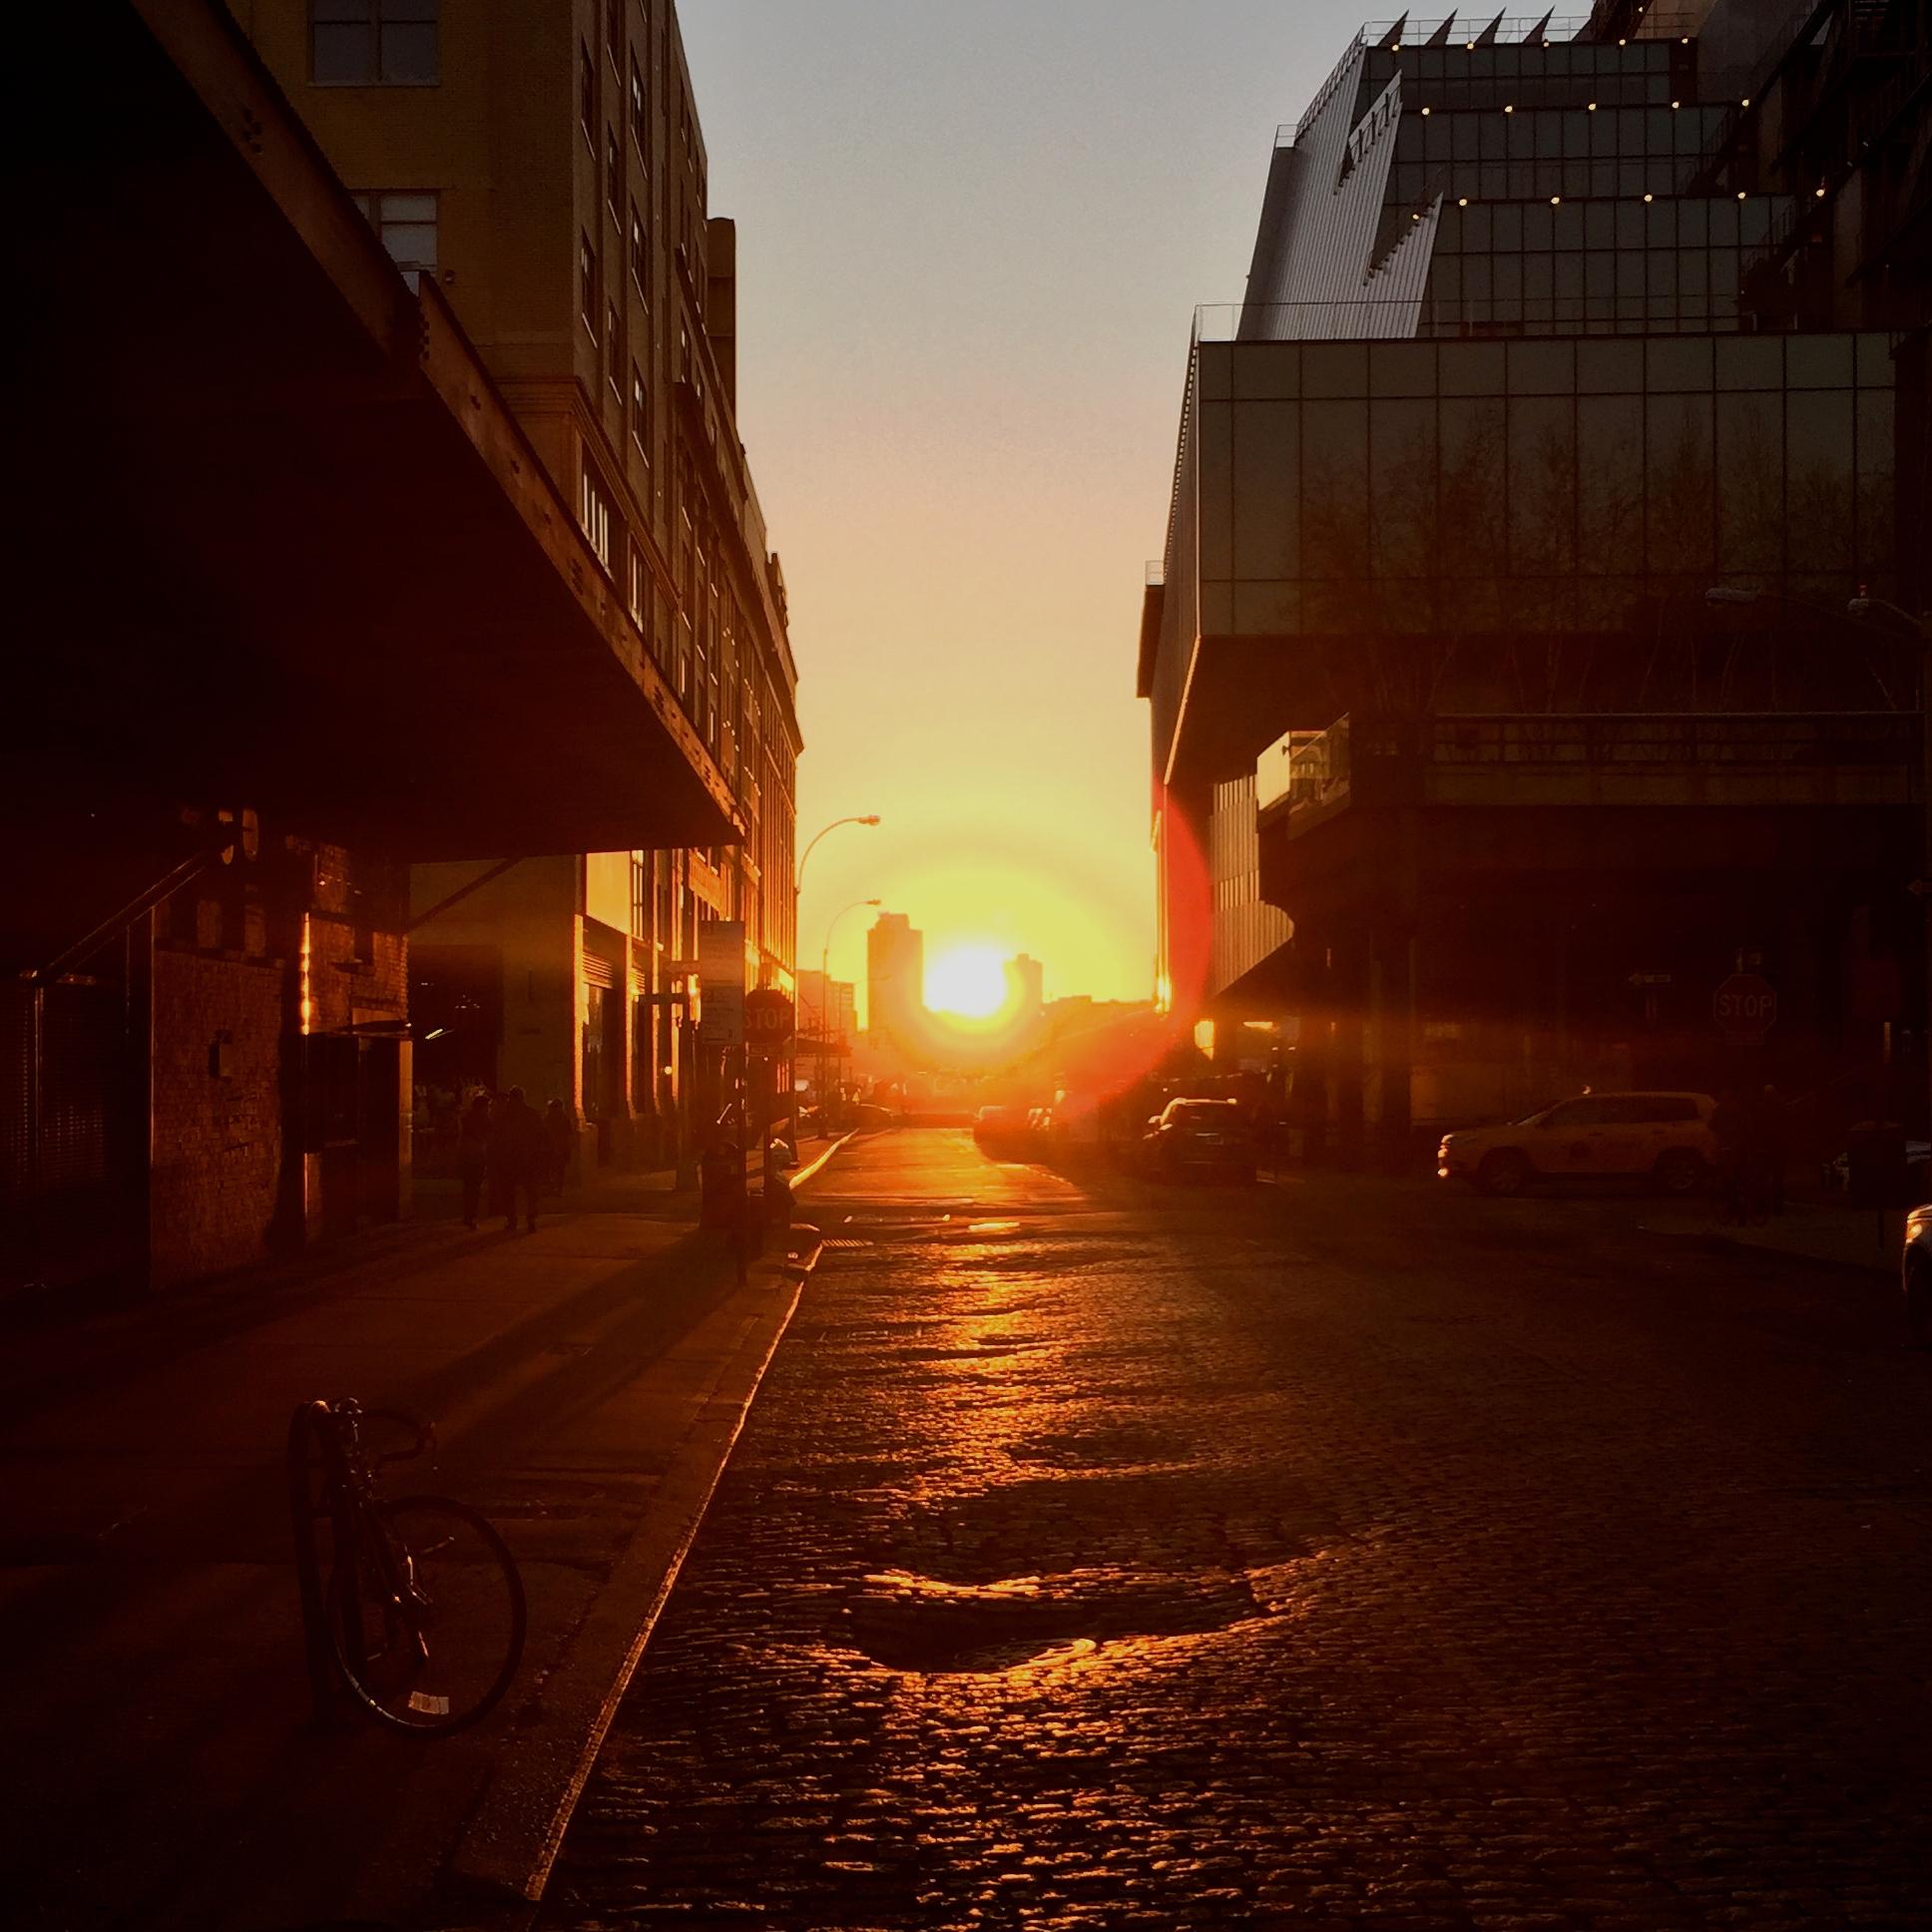 File:Greenwich Village NYC Sunset 032415 Gansevoort Street